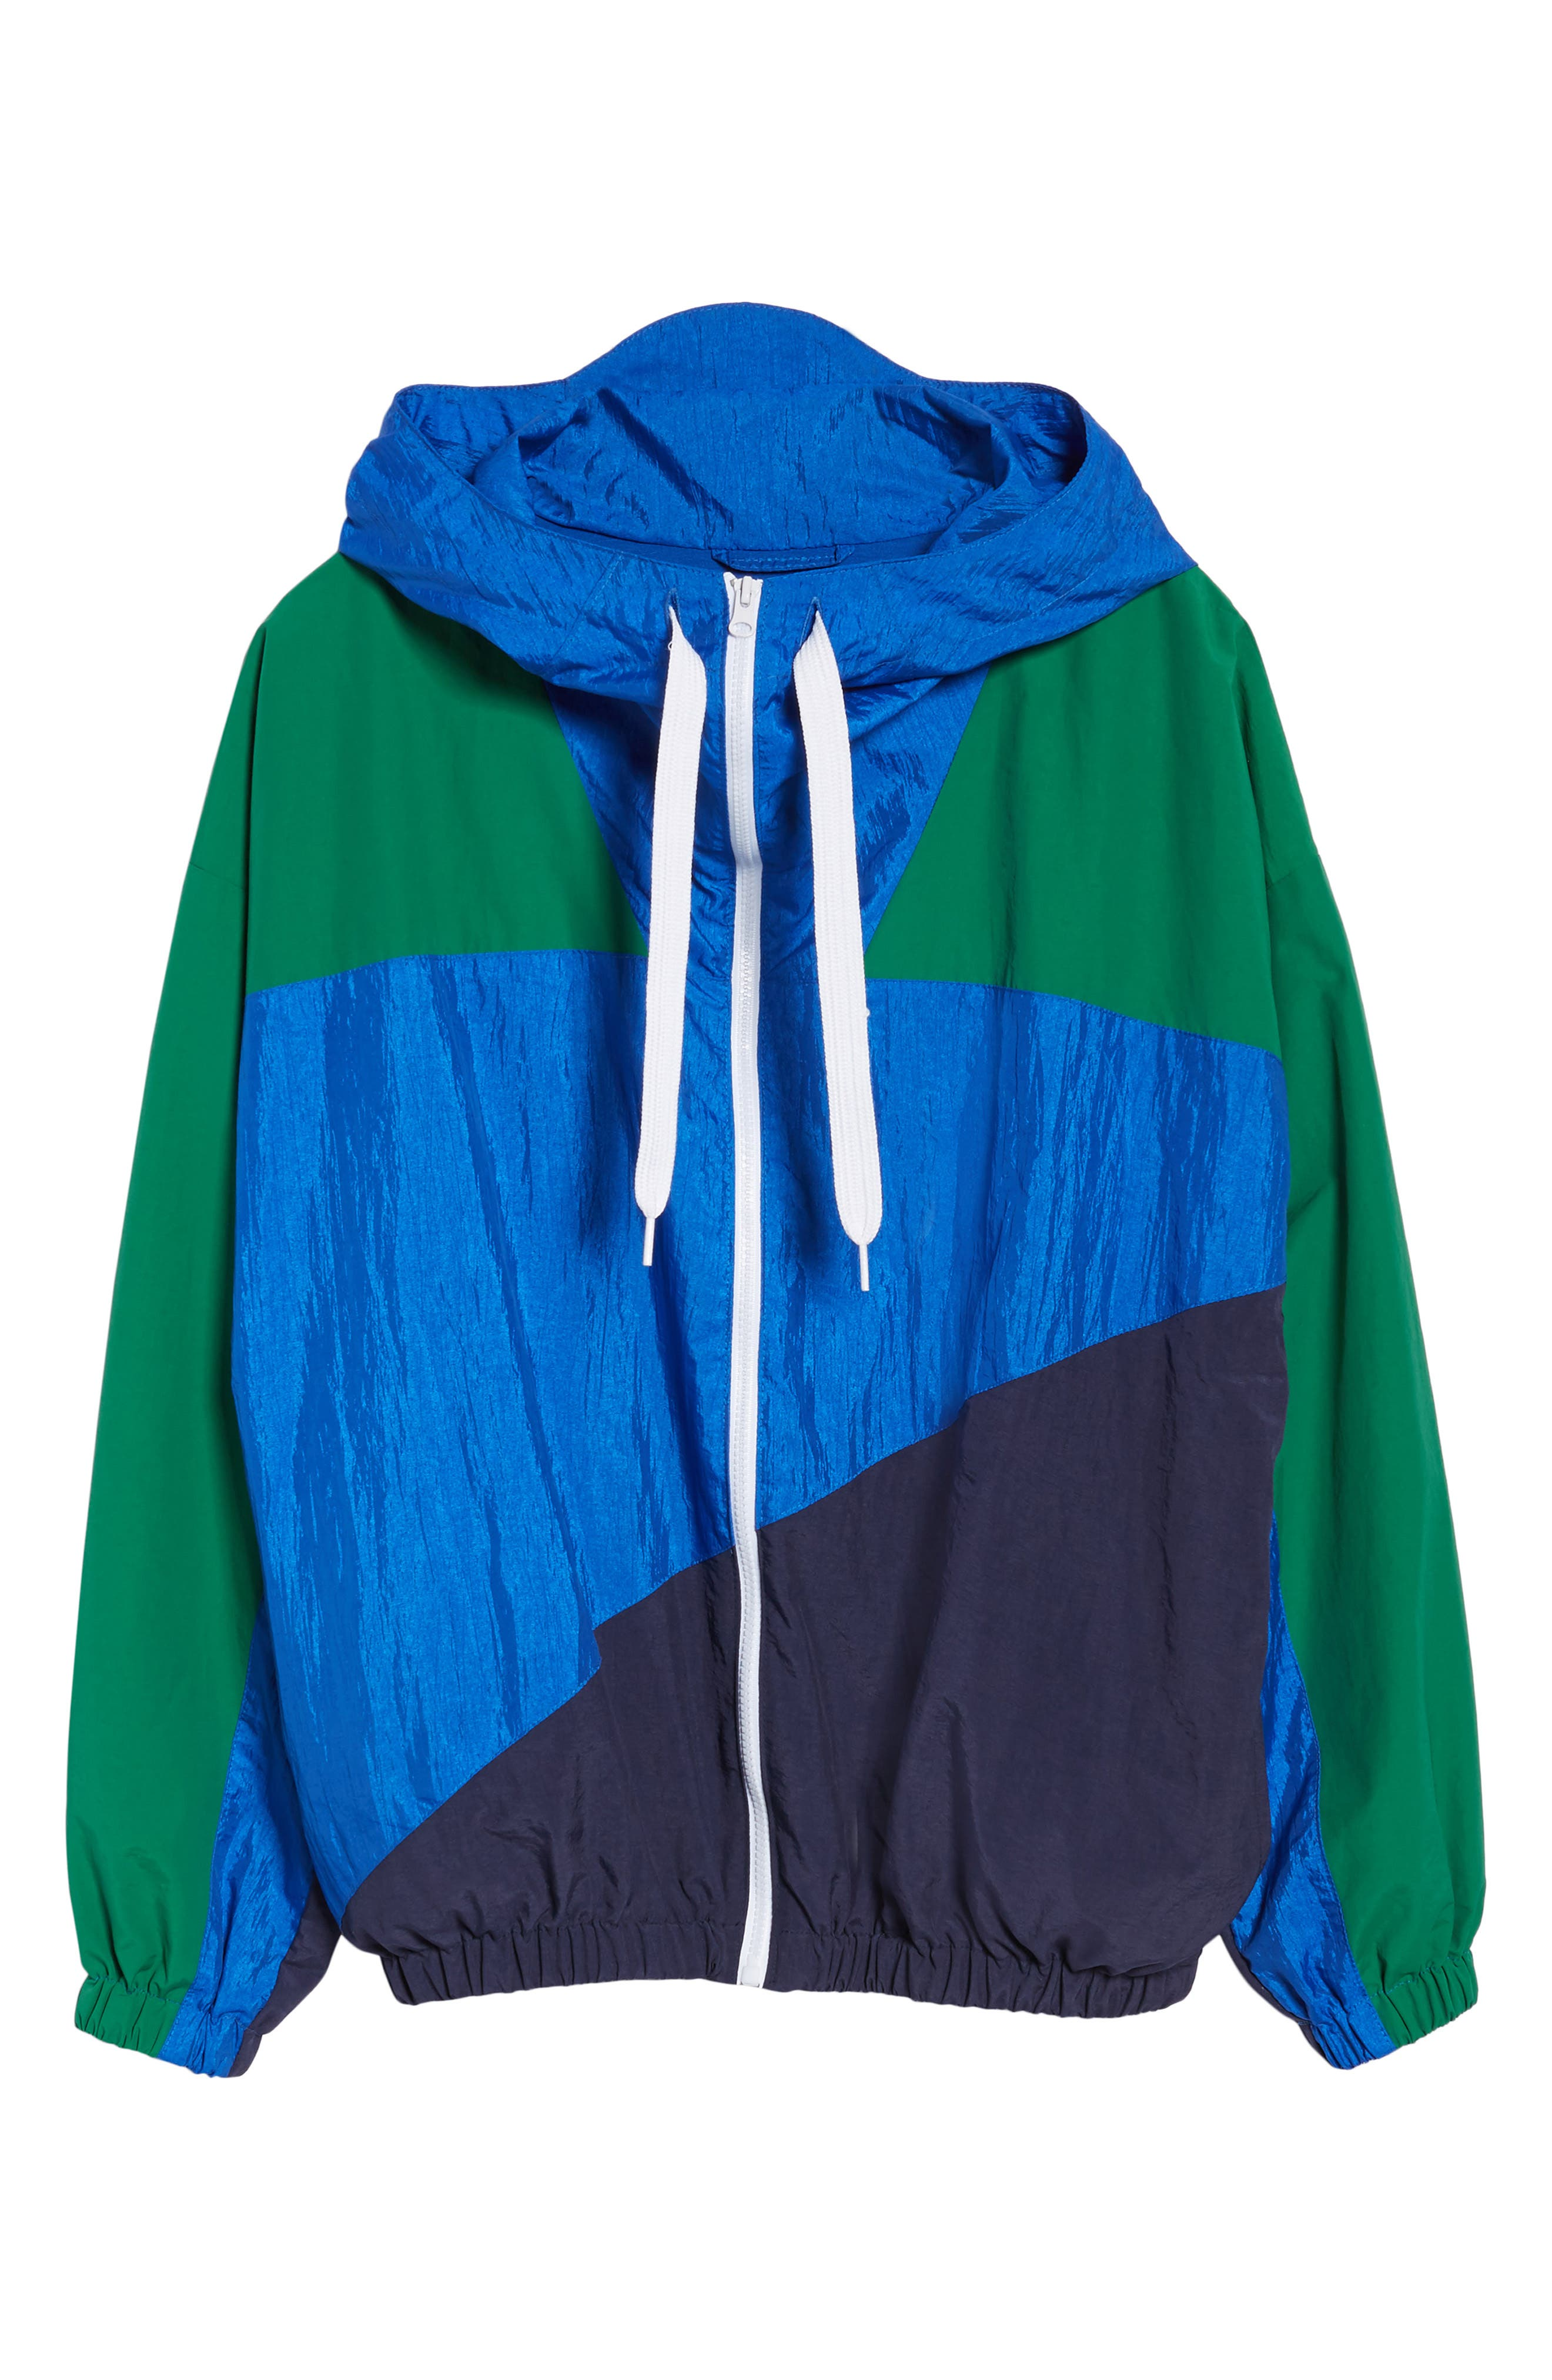 Colorblock Windbreaker Jacket,                             Alternate thumbnail 6, color,                             Green/ Blue